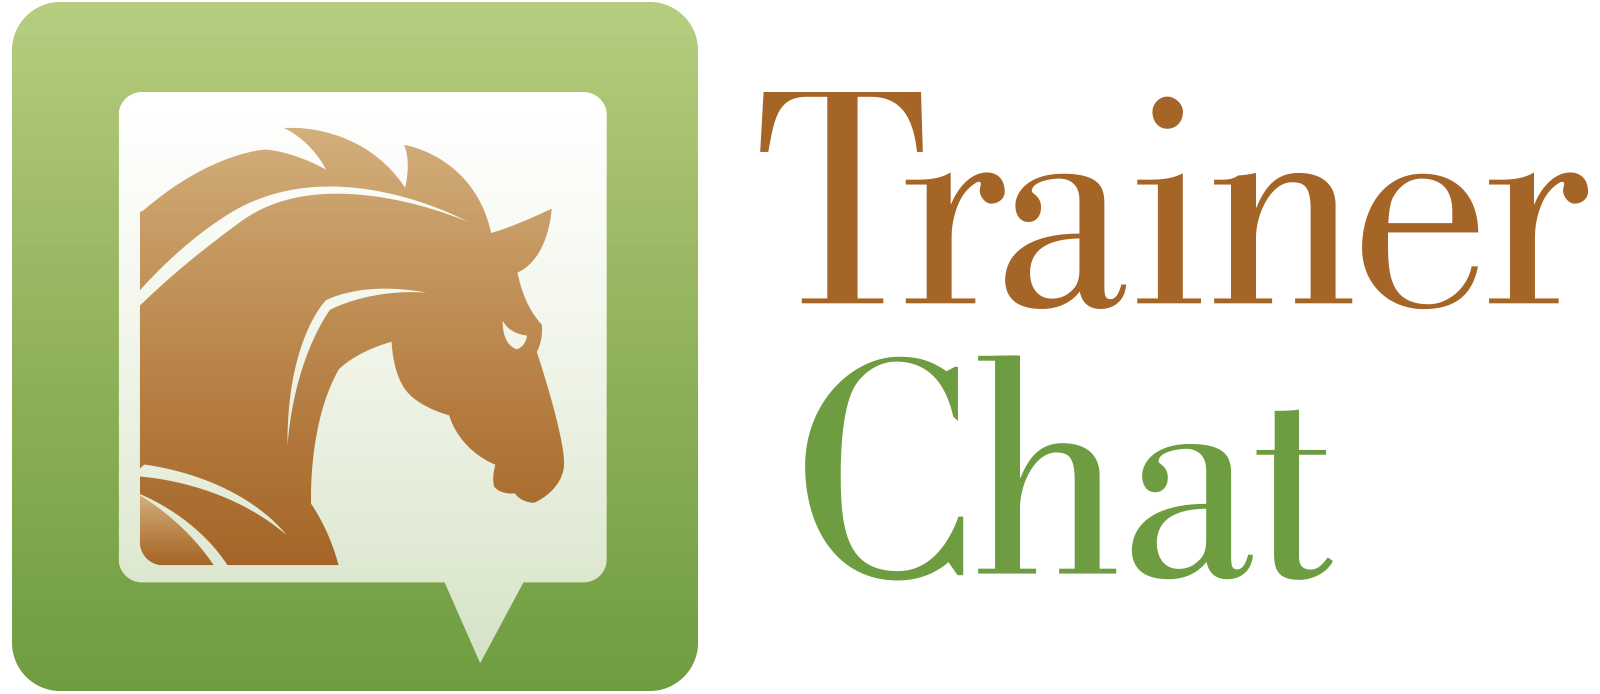 trainer chat logo